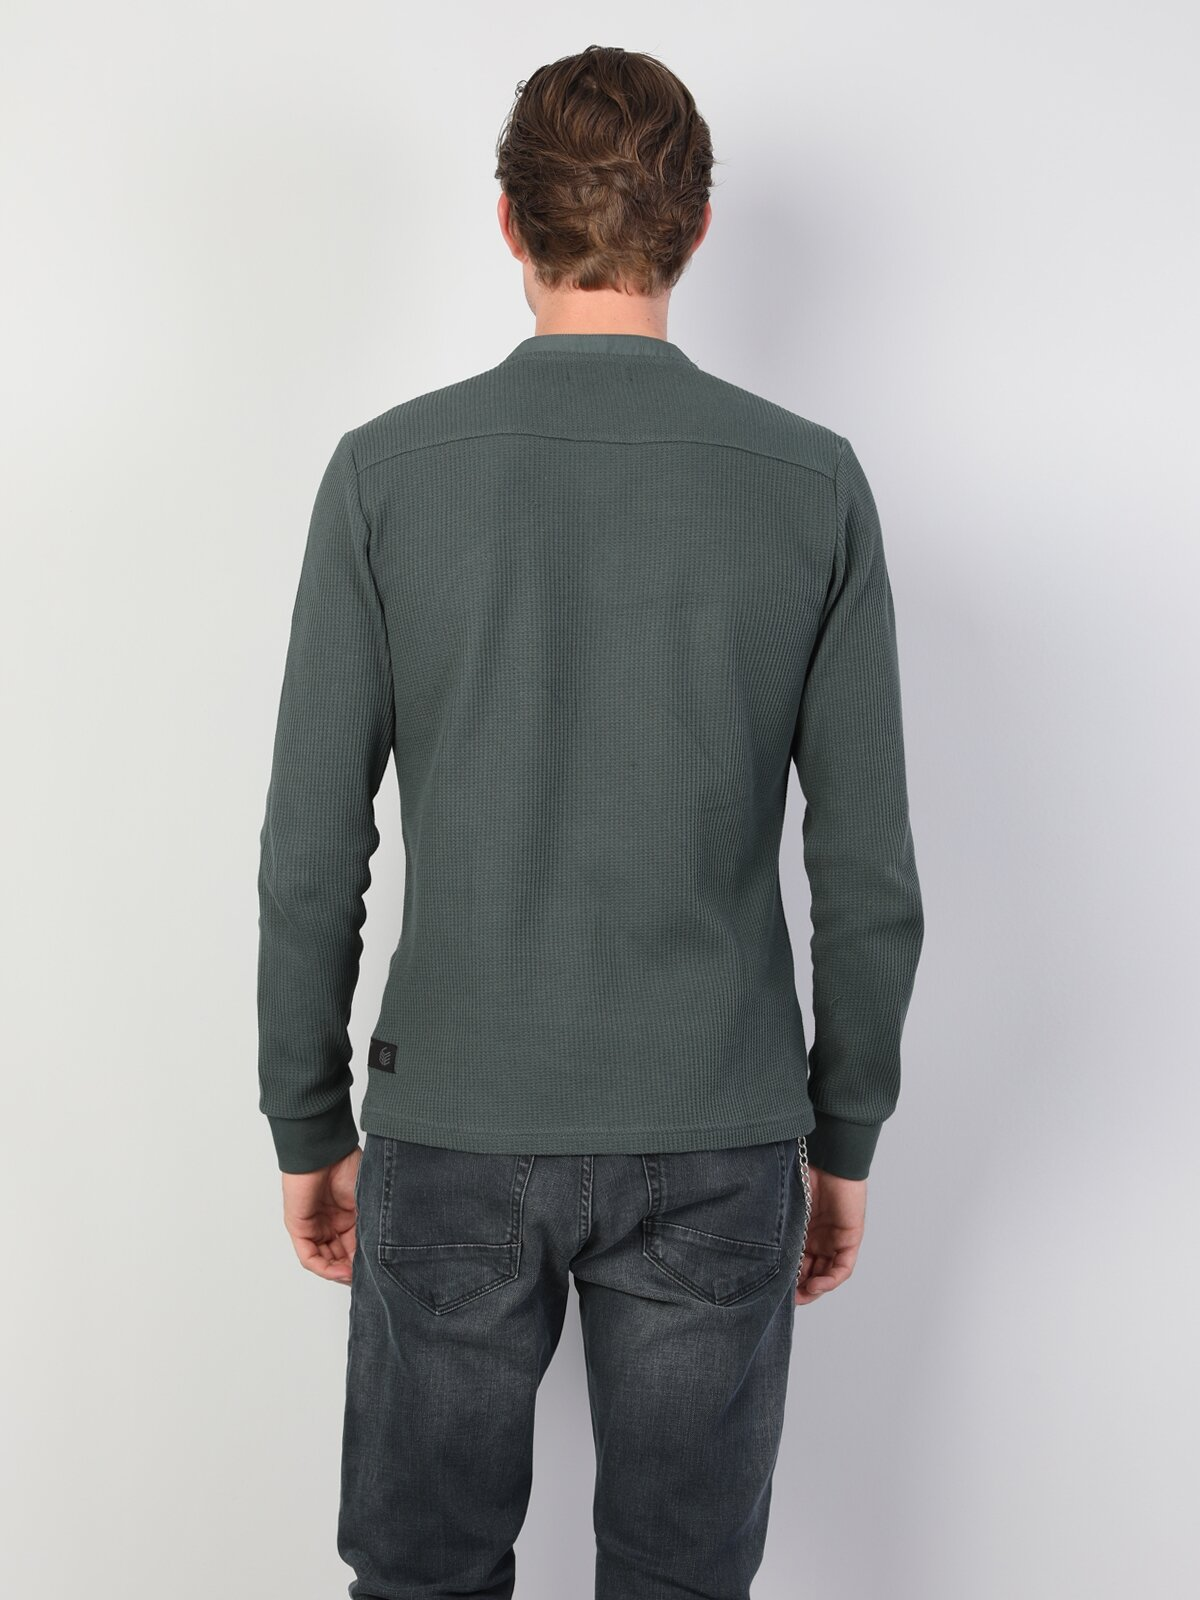 Slim Fit Placket Neck Erkek Yeşil Tshirt U.Kol